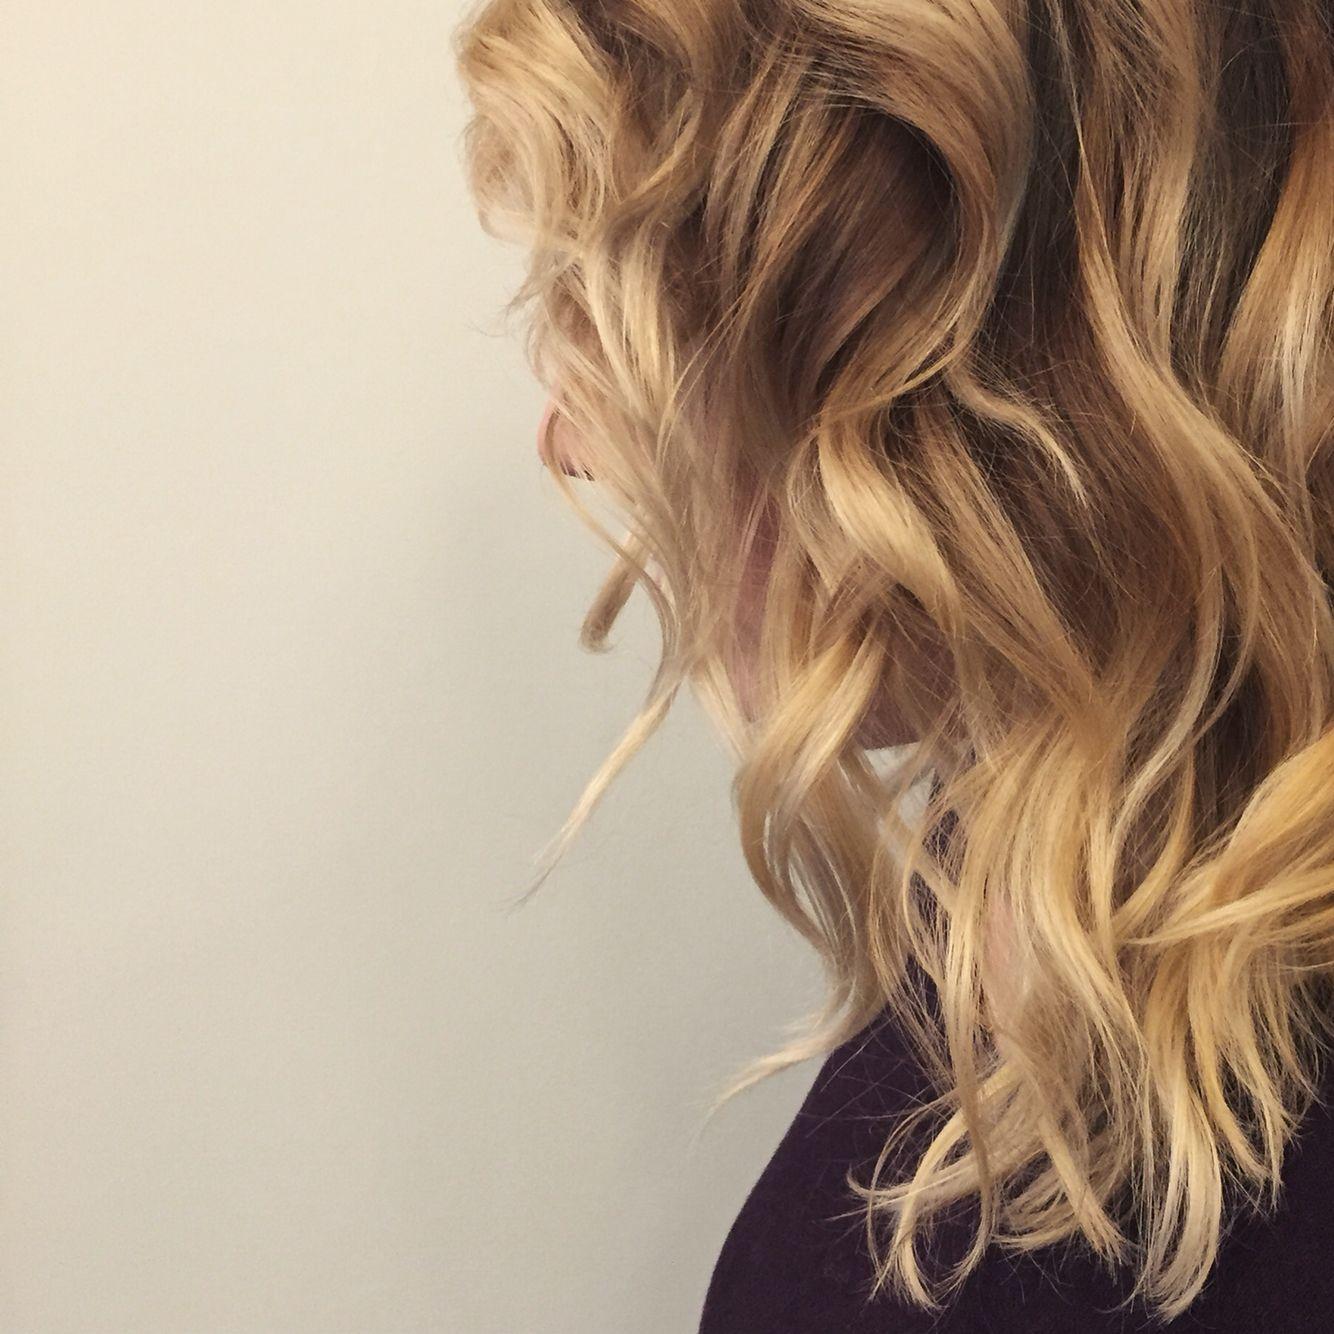 By Hollylikeshair In Portland Or At Blueprint Modern Hair Lob Bob Longbob Beach Waves Balayage Blonde H Modern Hairstyles Long Hair Styles Hair Styles